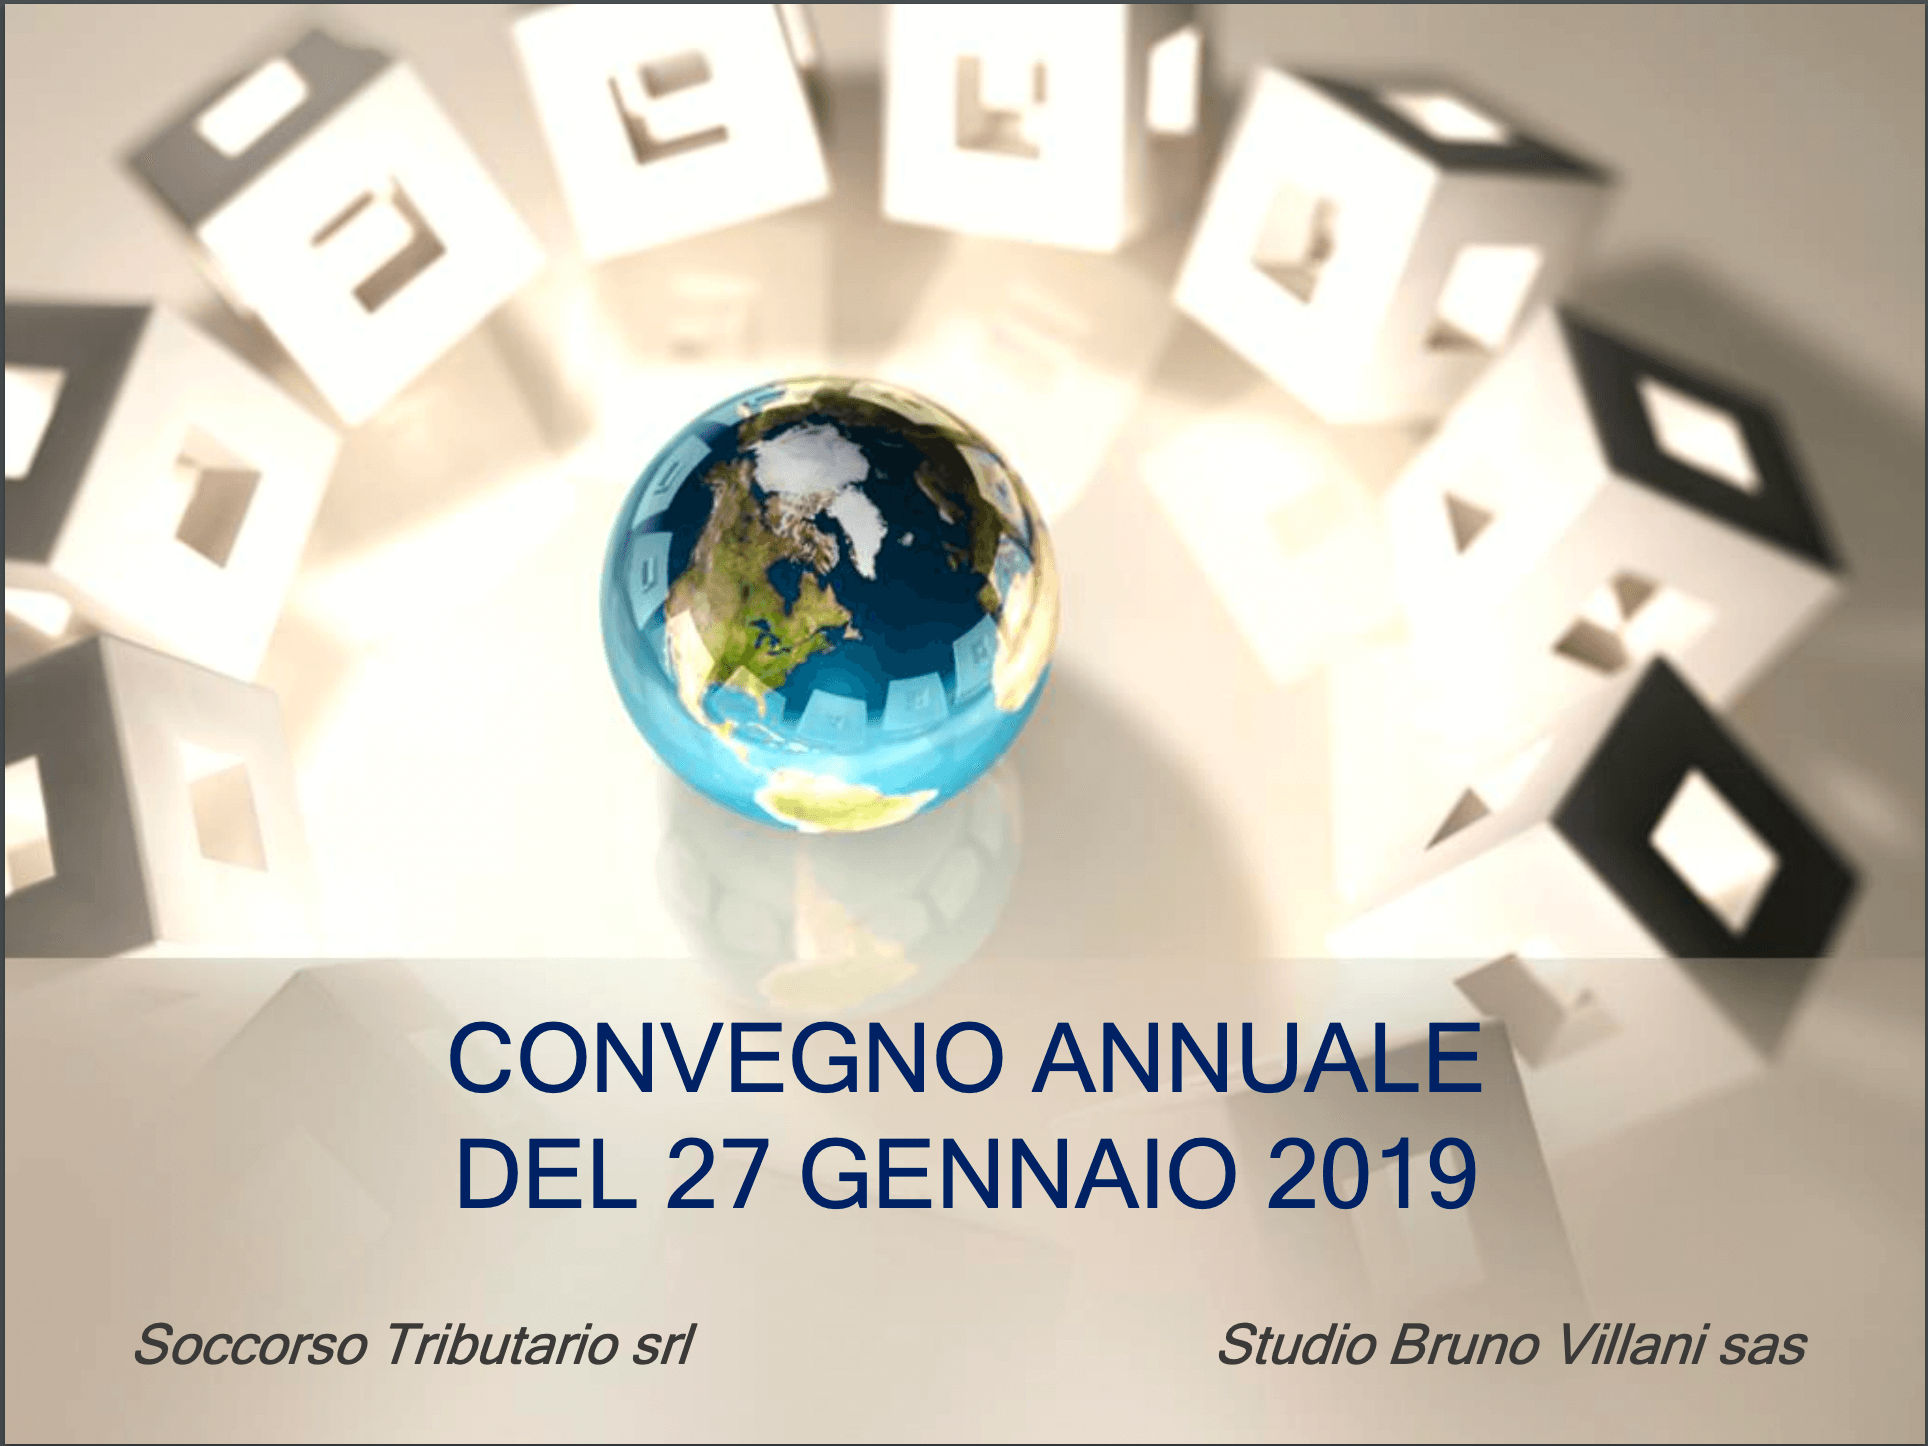 CONVEGNO 27 GENNAIO 2019